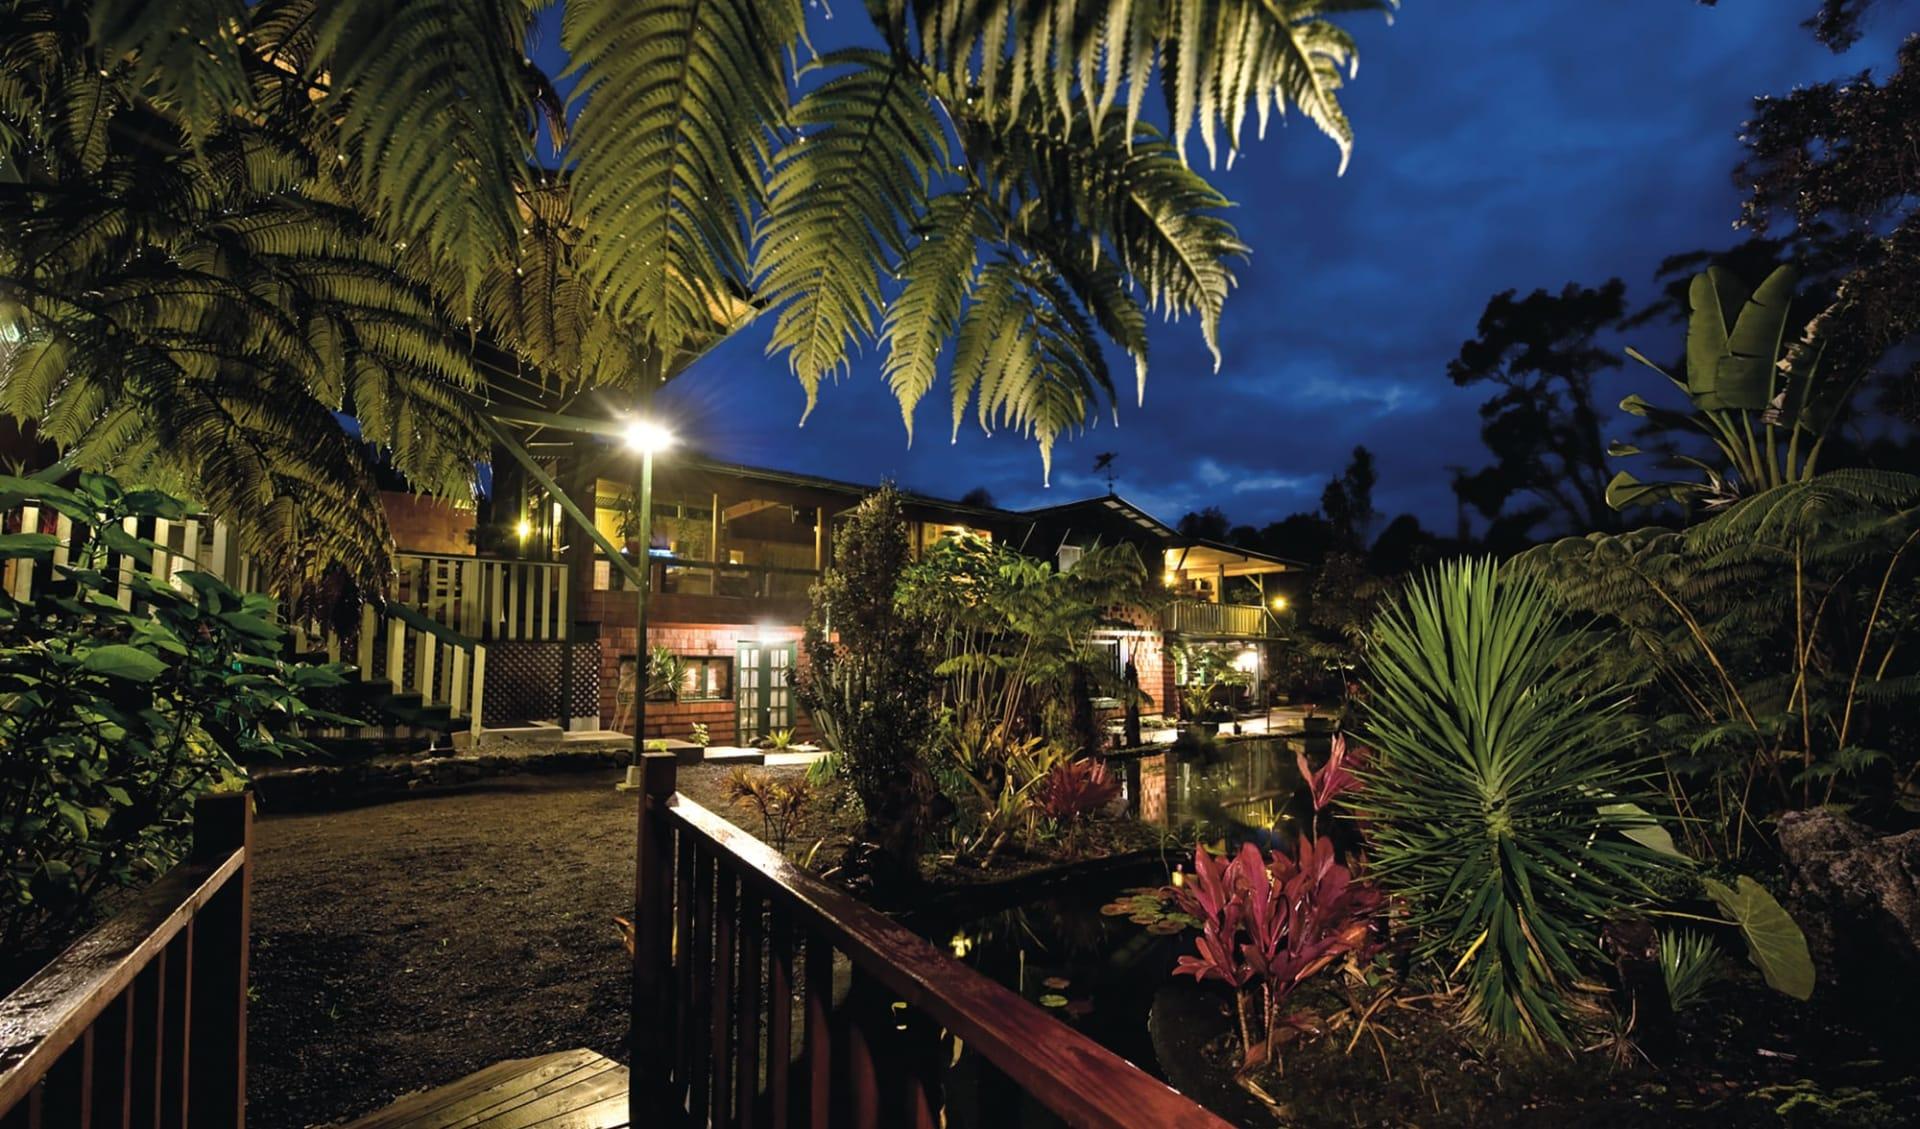 Chalet Kilauea- Hotel in Hawaii Volcanoes National Park:  Exterior_Chalet Kilauea_Aussenansicht